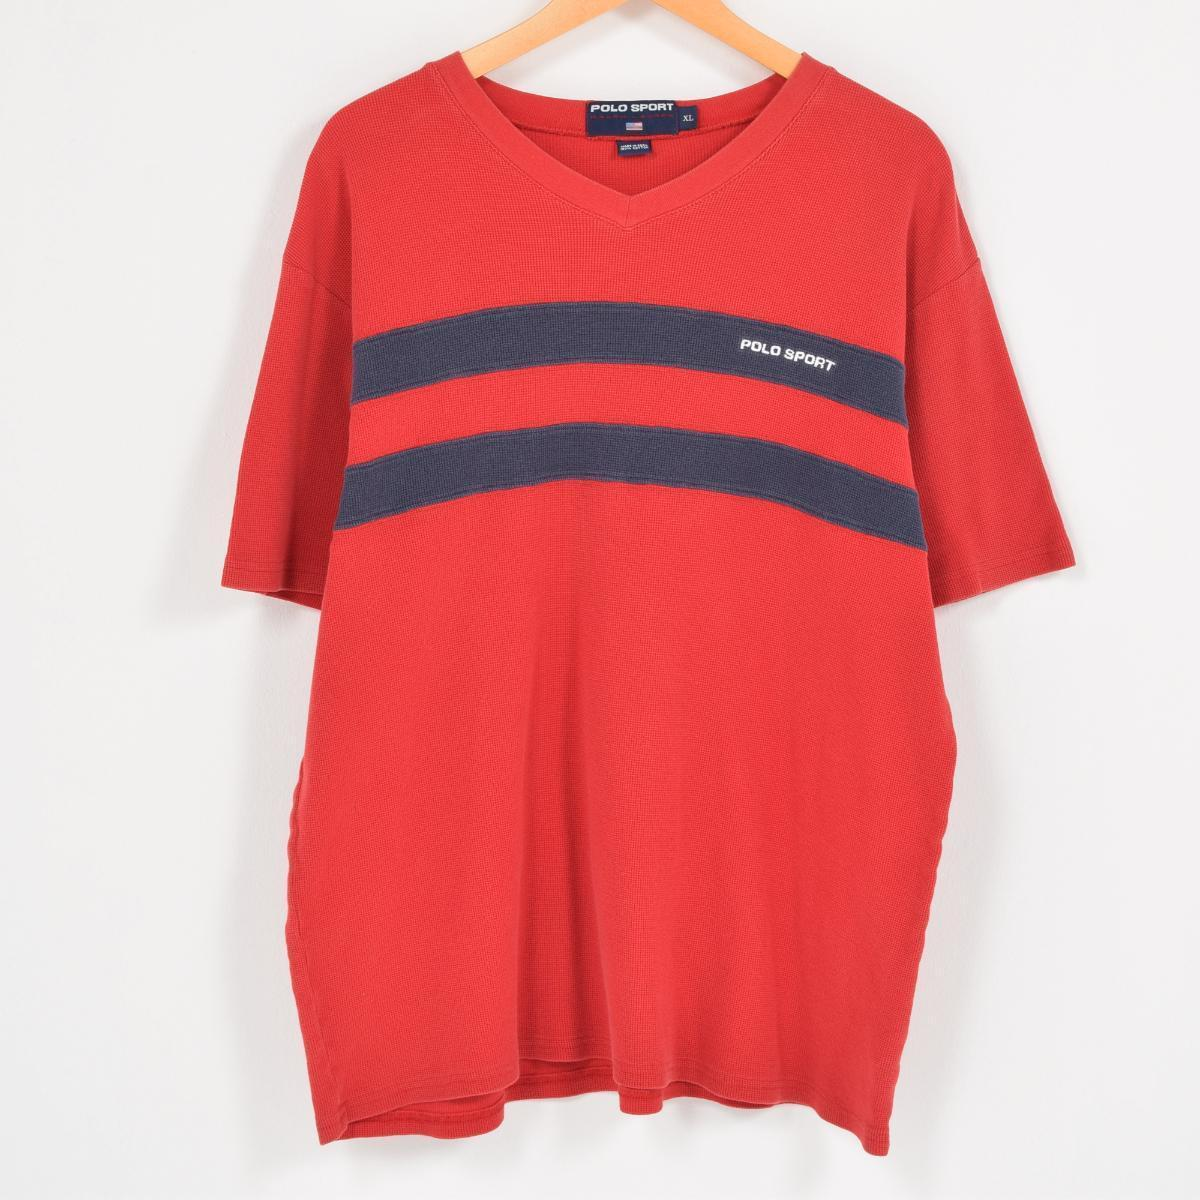 Vintage Clothing Jam 90s Ralph Lauren Ralph Lauren Polo Sport Polo